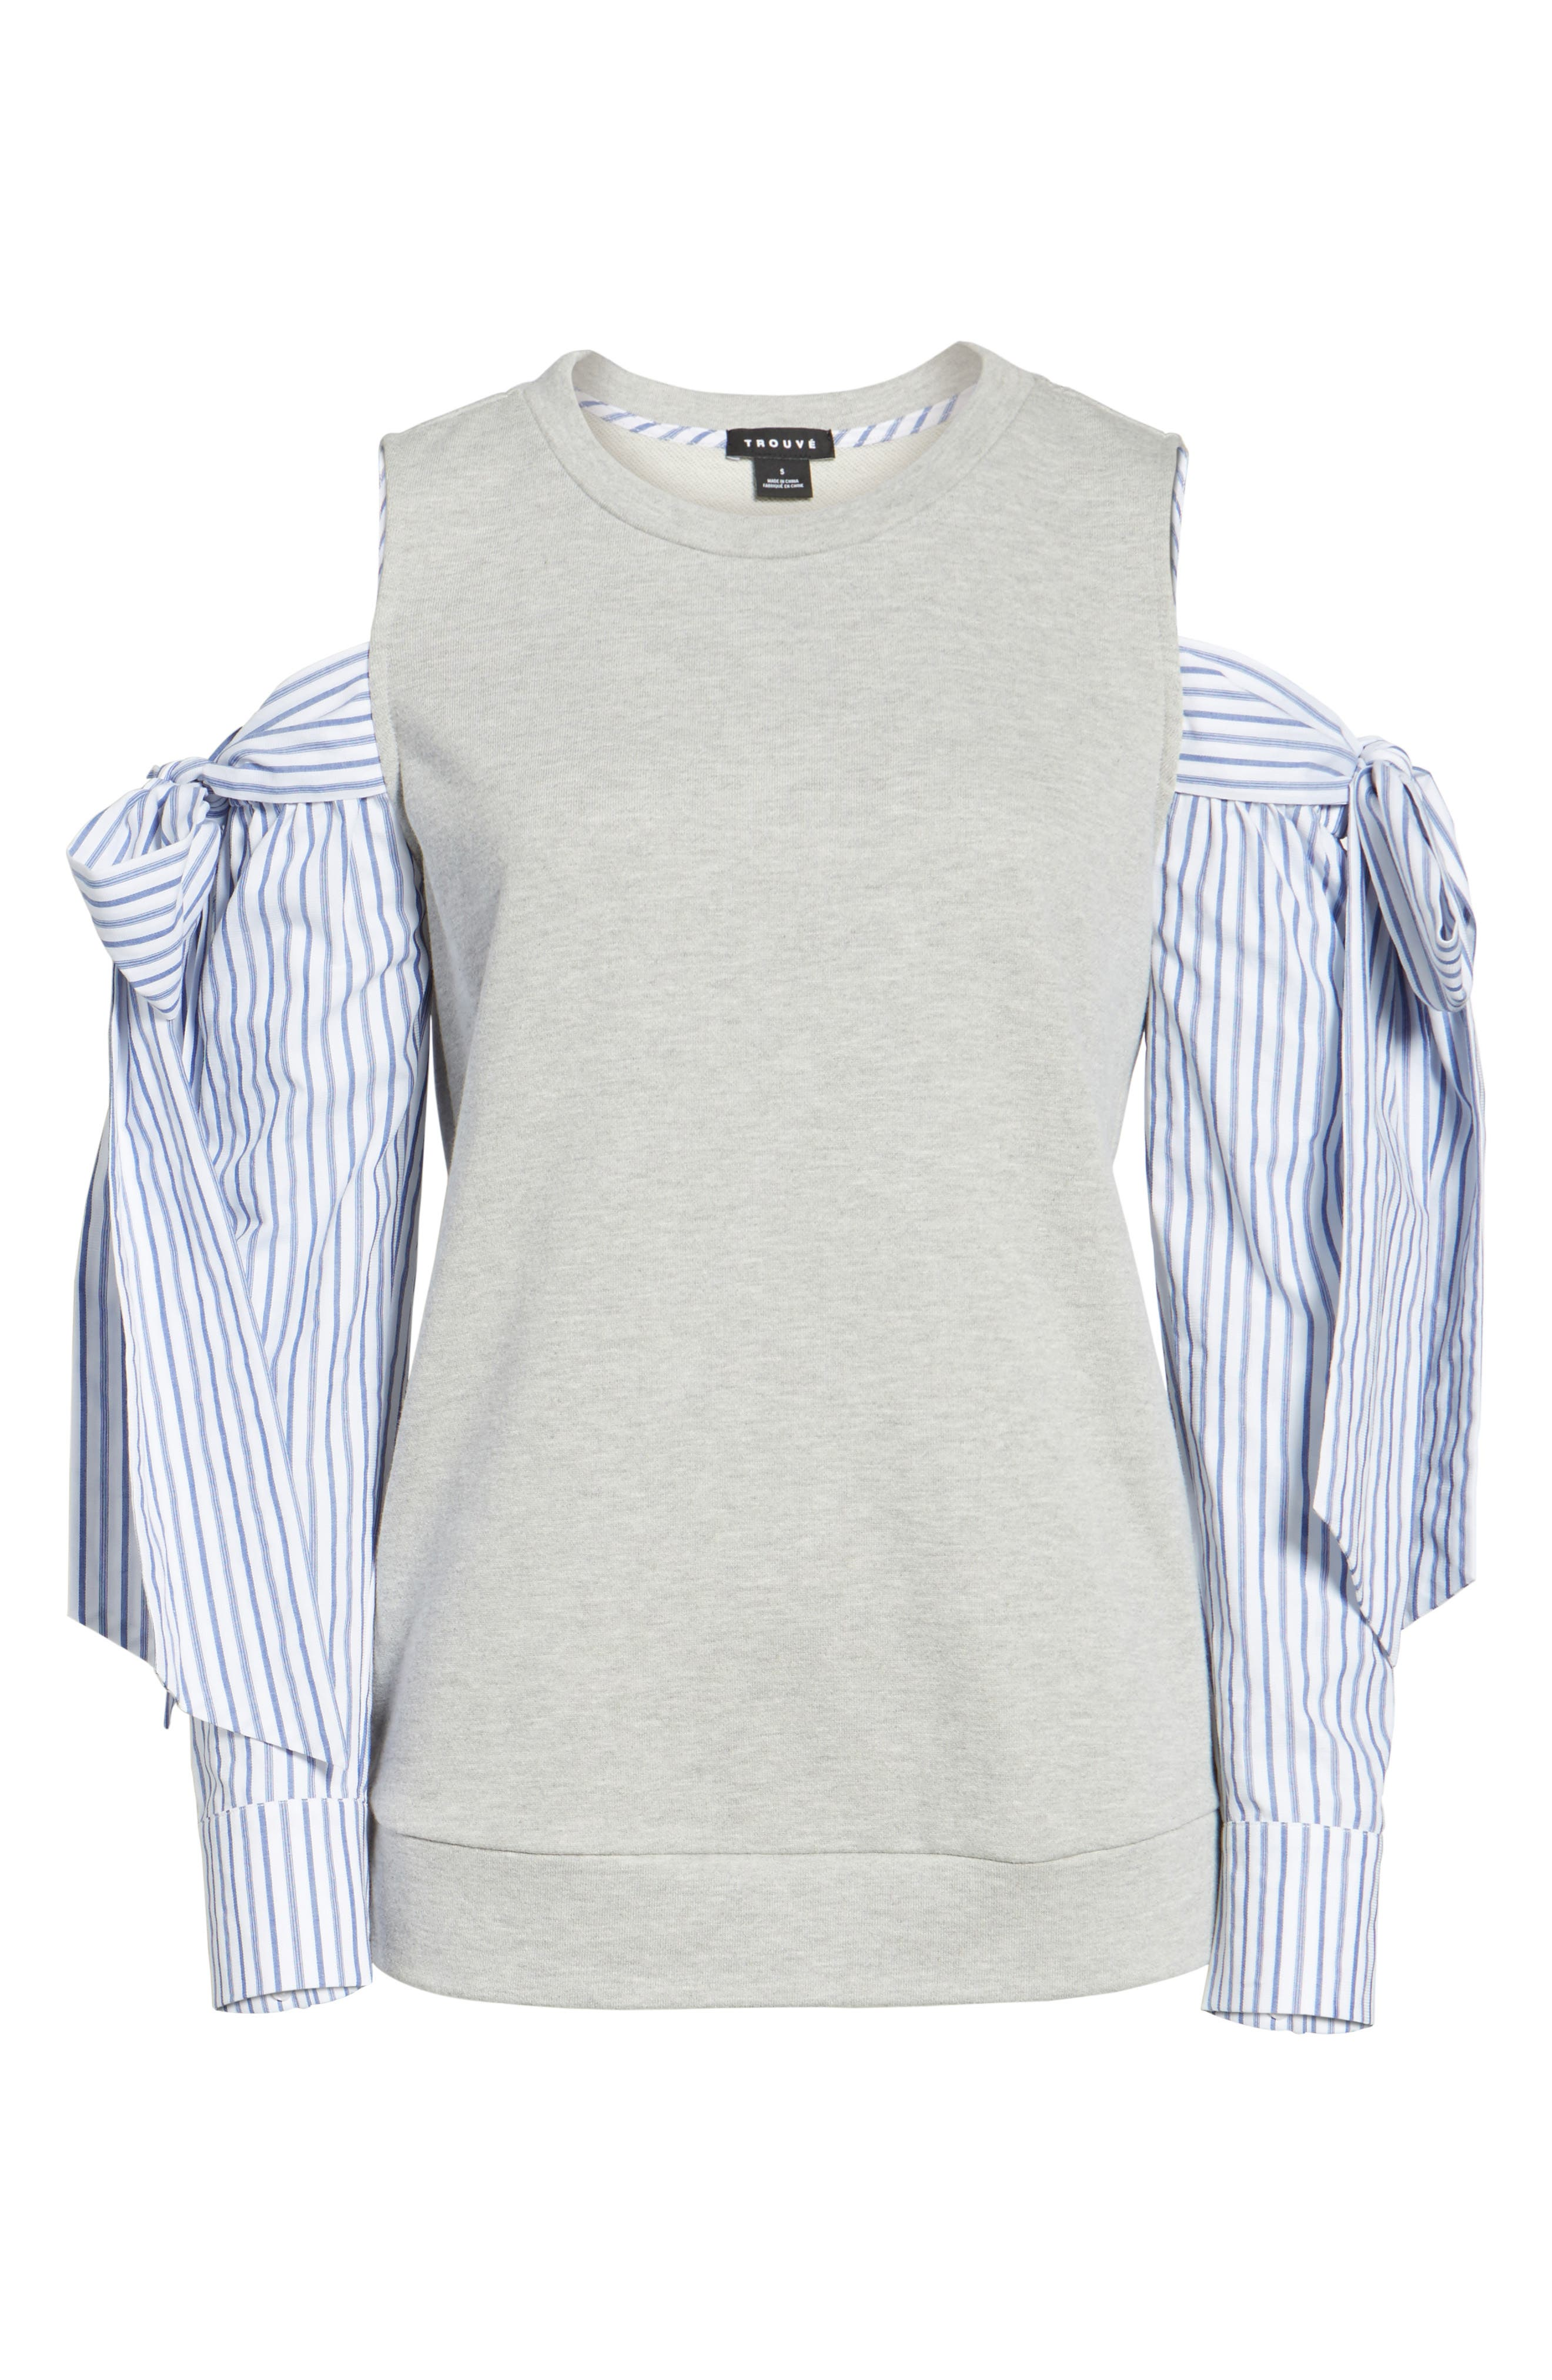 Cold Shoulder Sweatshirt,                             Alternate thumbnail 4, color,                             Grey Heather